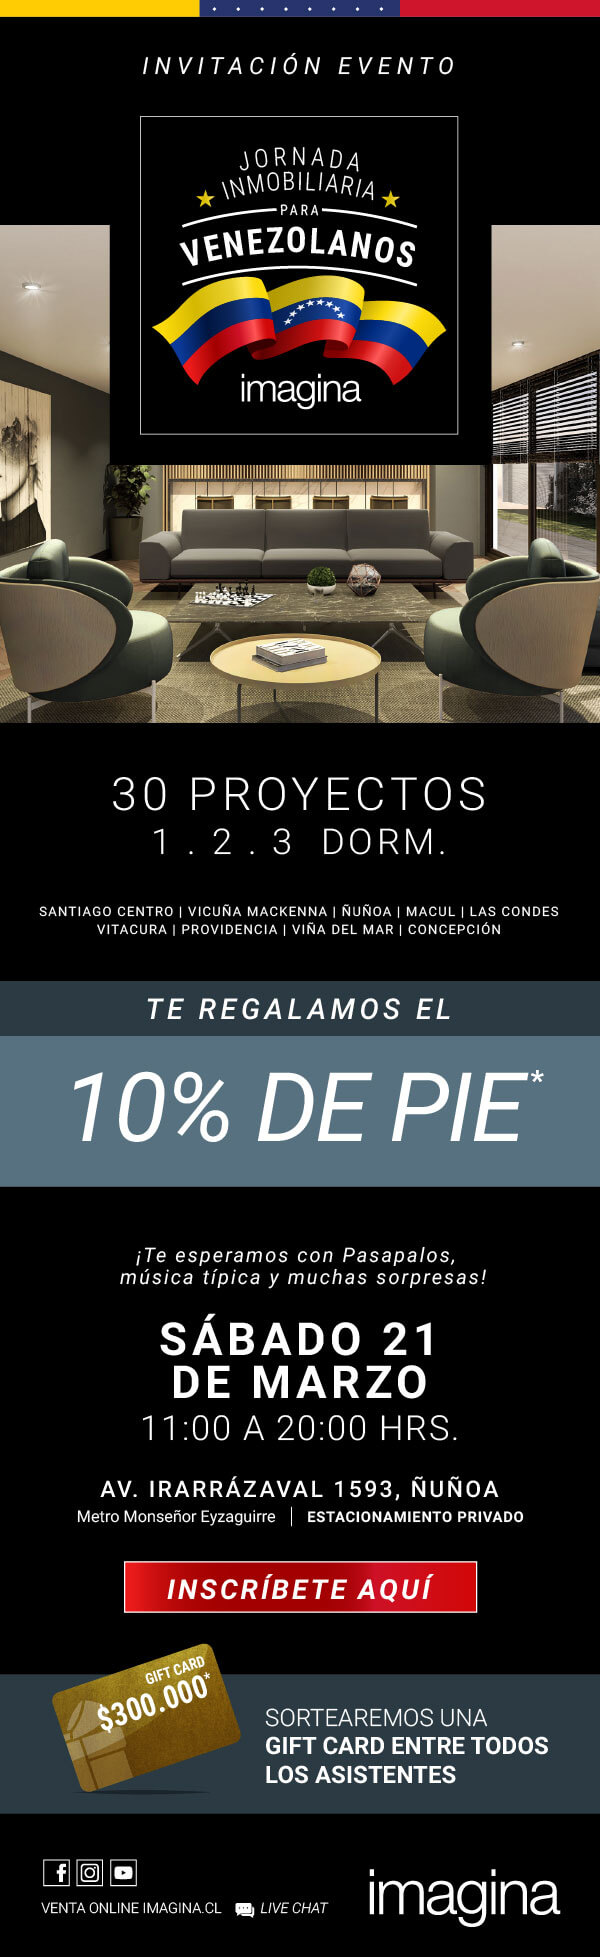 13er evento inmobiliaria imagina para venezolanos